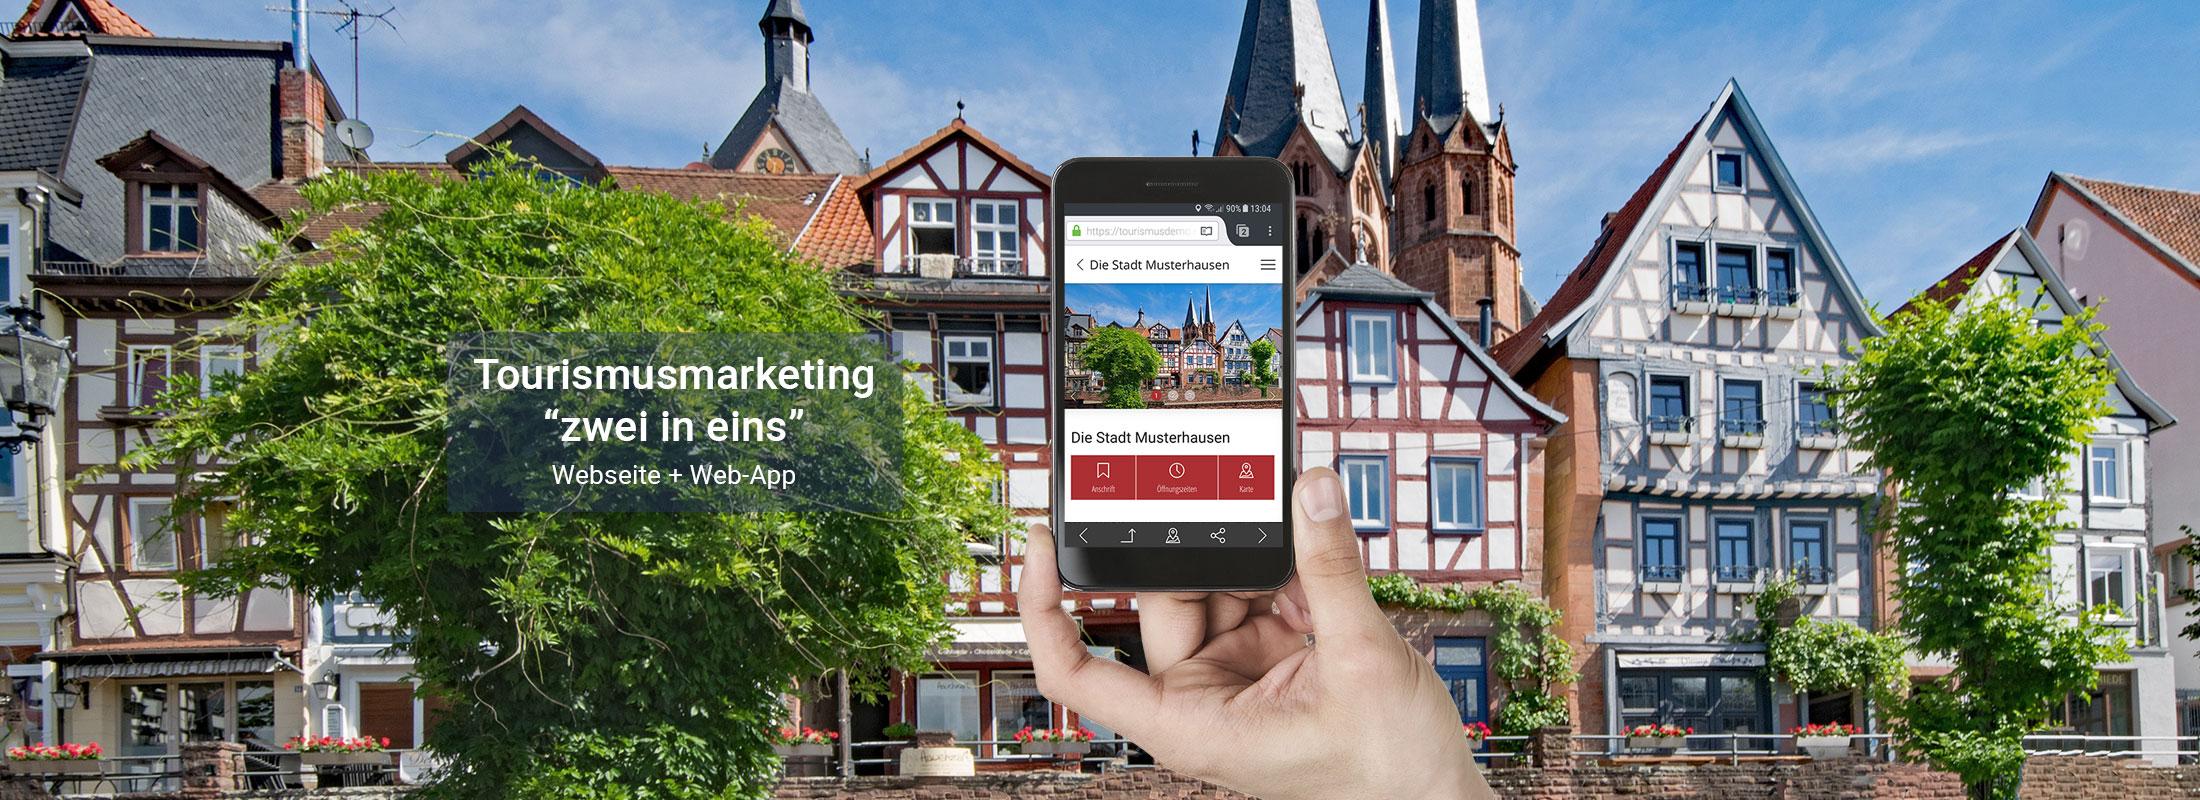 satelles mobilewebguide: digitales Tourismusmarketing, Web App und Webseite in einem